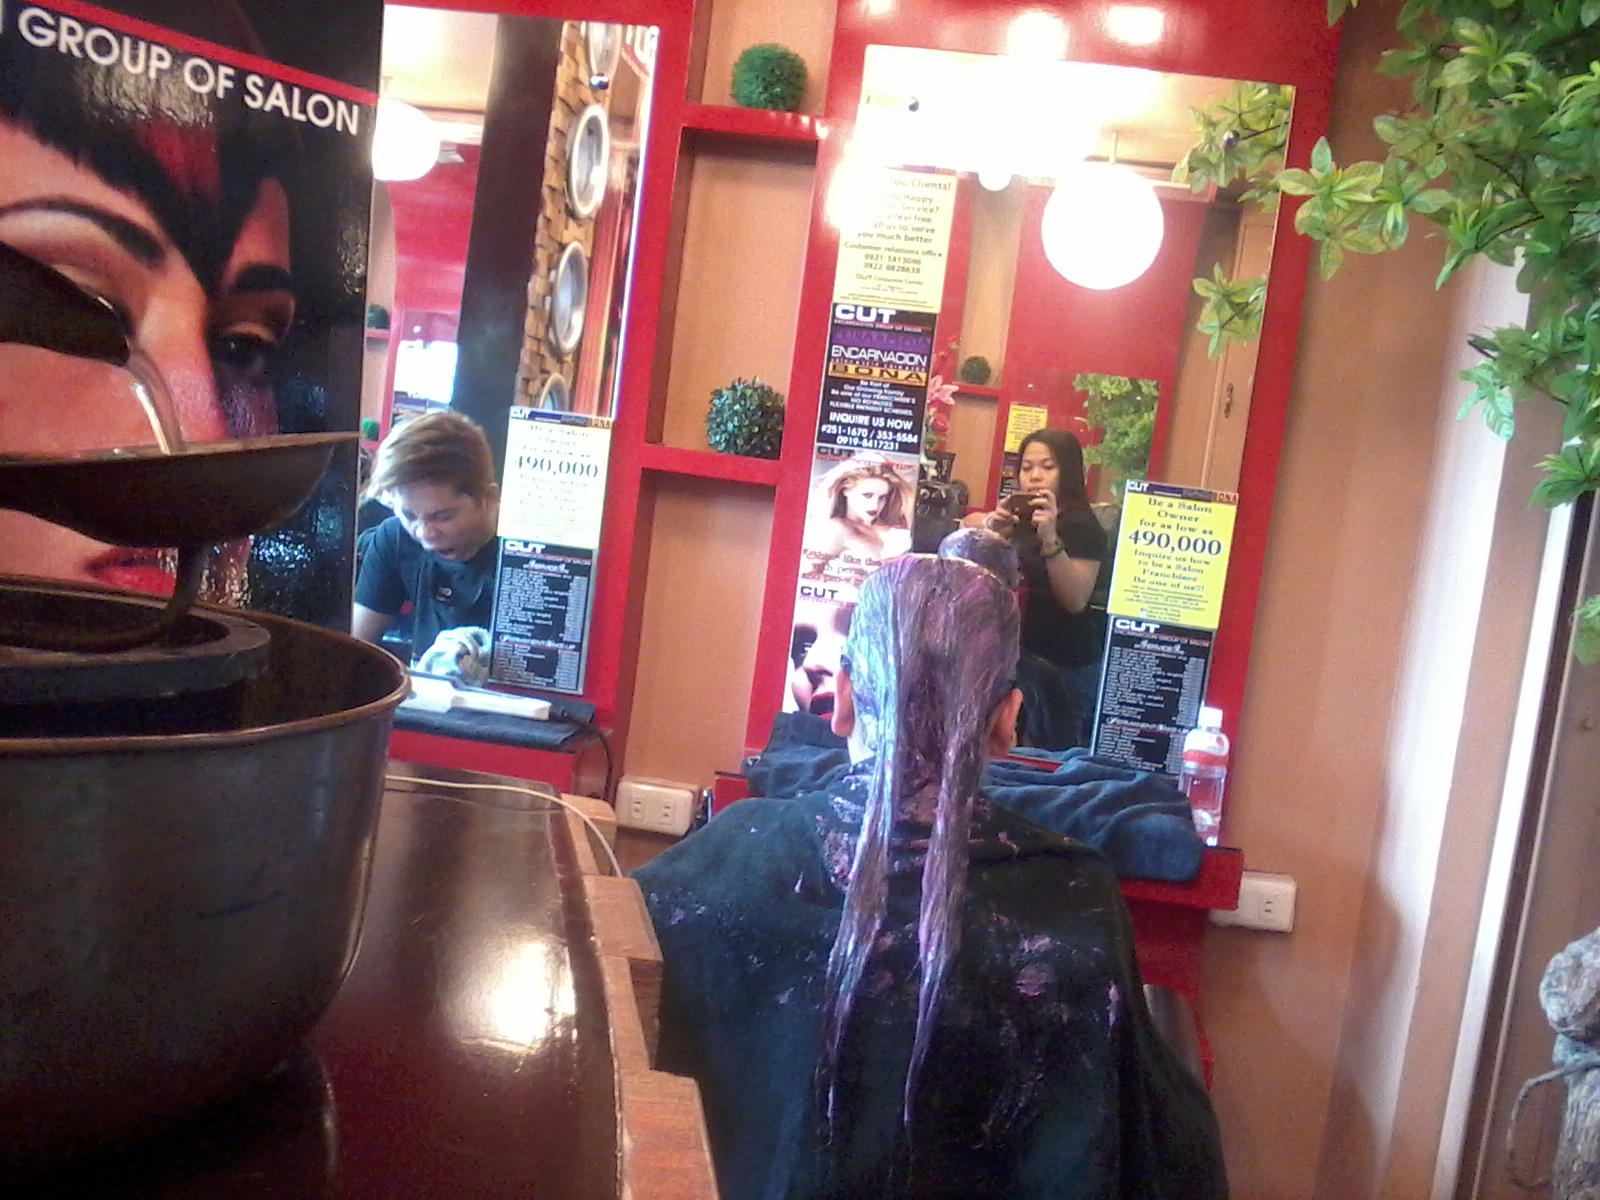 Anything so beautiful rainy days in all days for V encarnacion salon